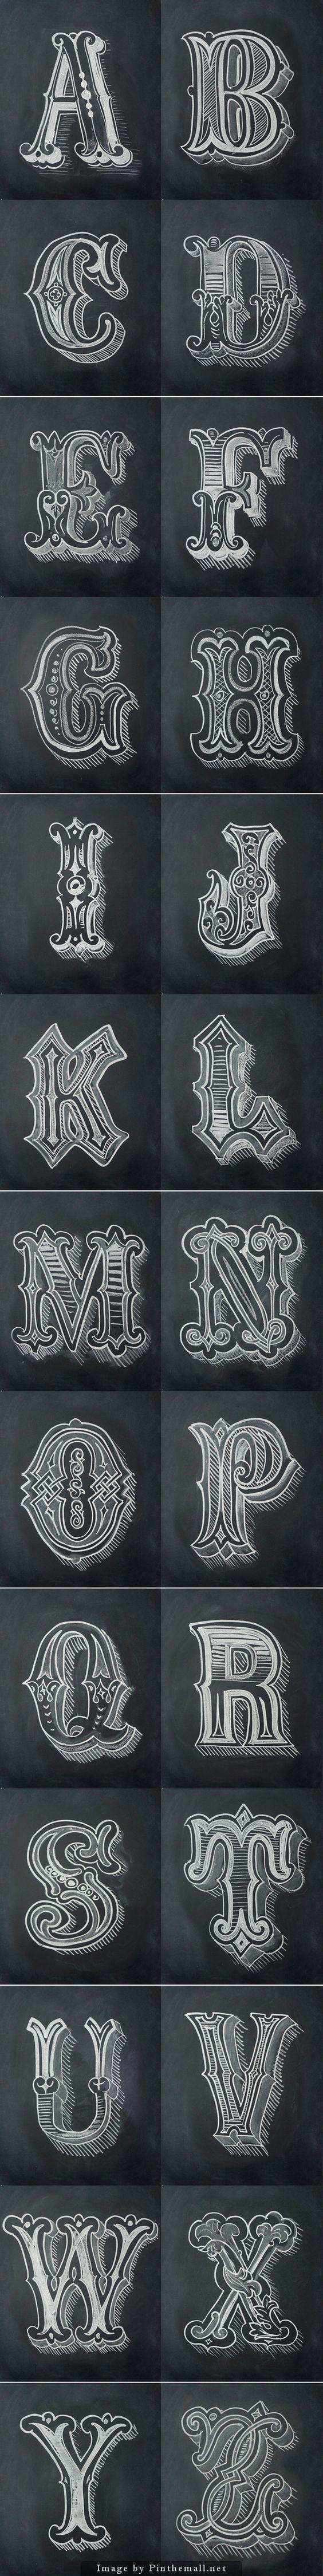 capitulares adornadas; formas e estilos diferentes na mesma letra; formas arredondadas e relacionadas a vegtais: